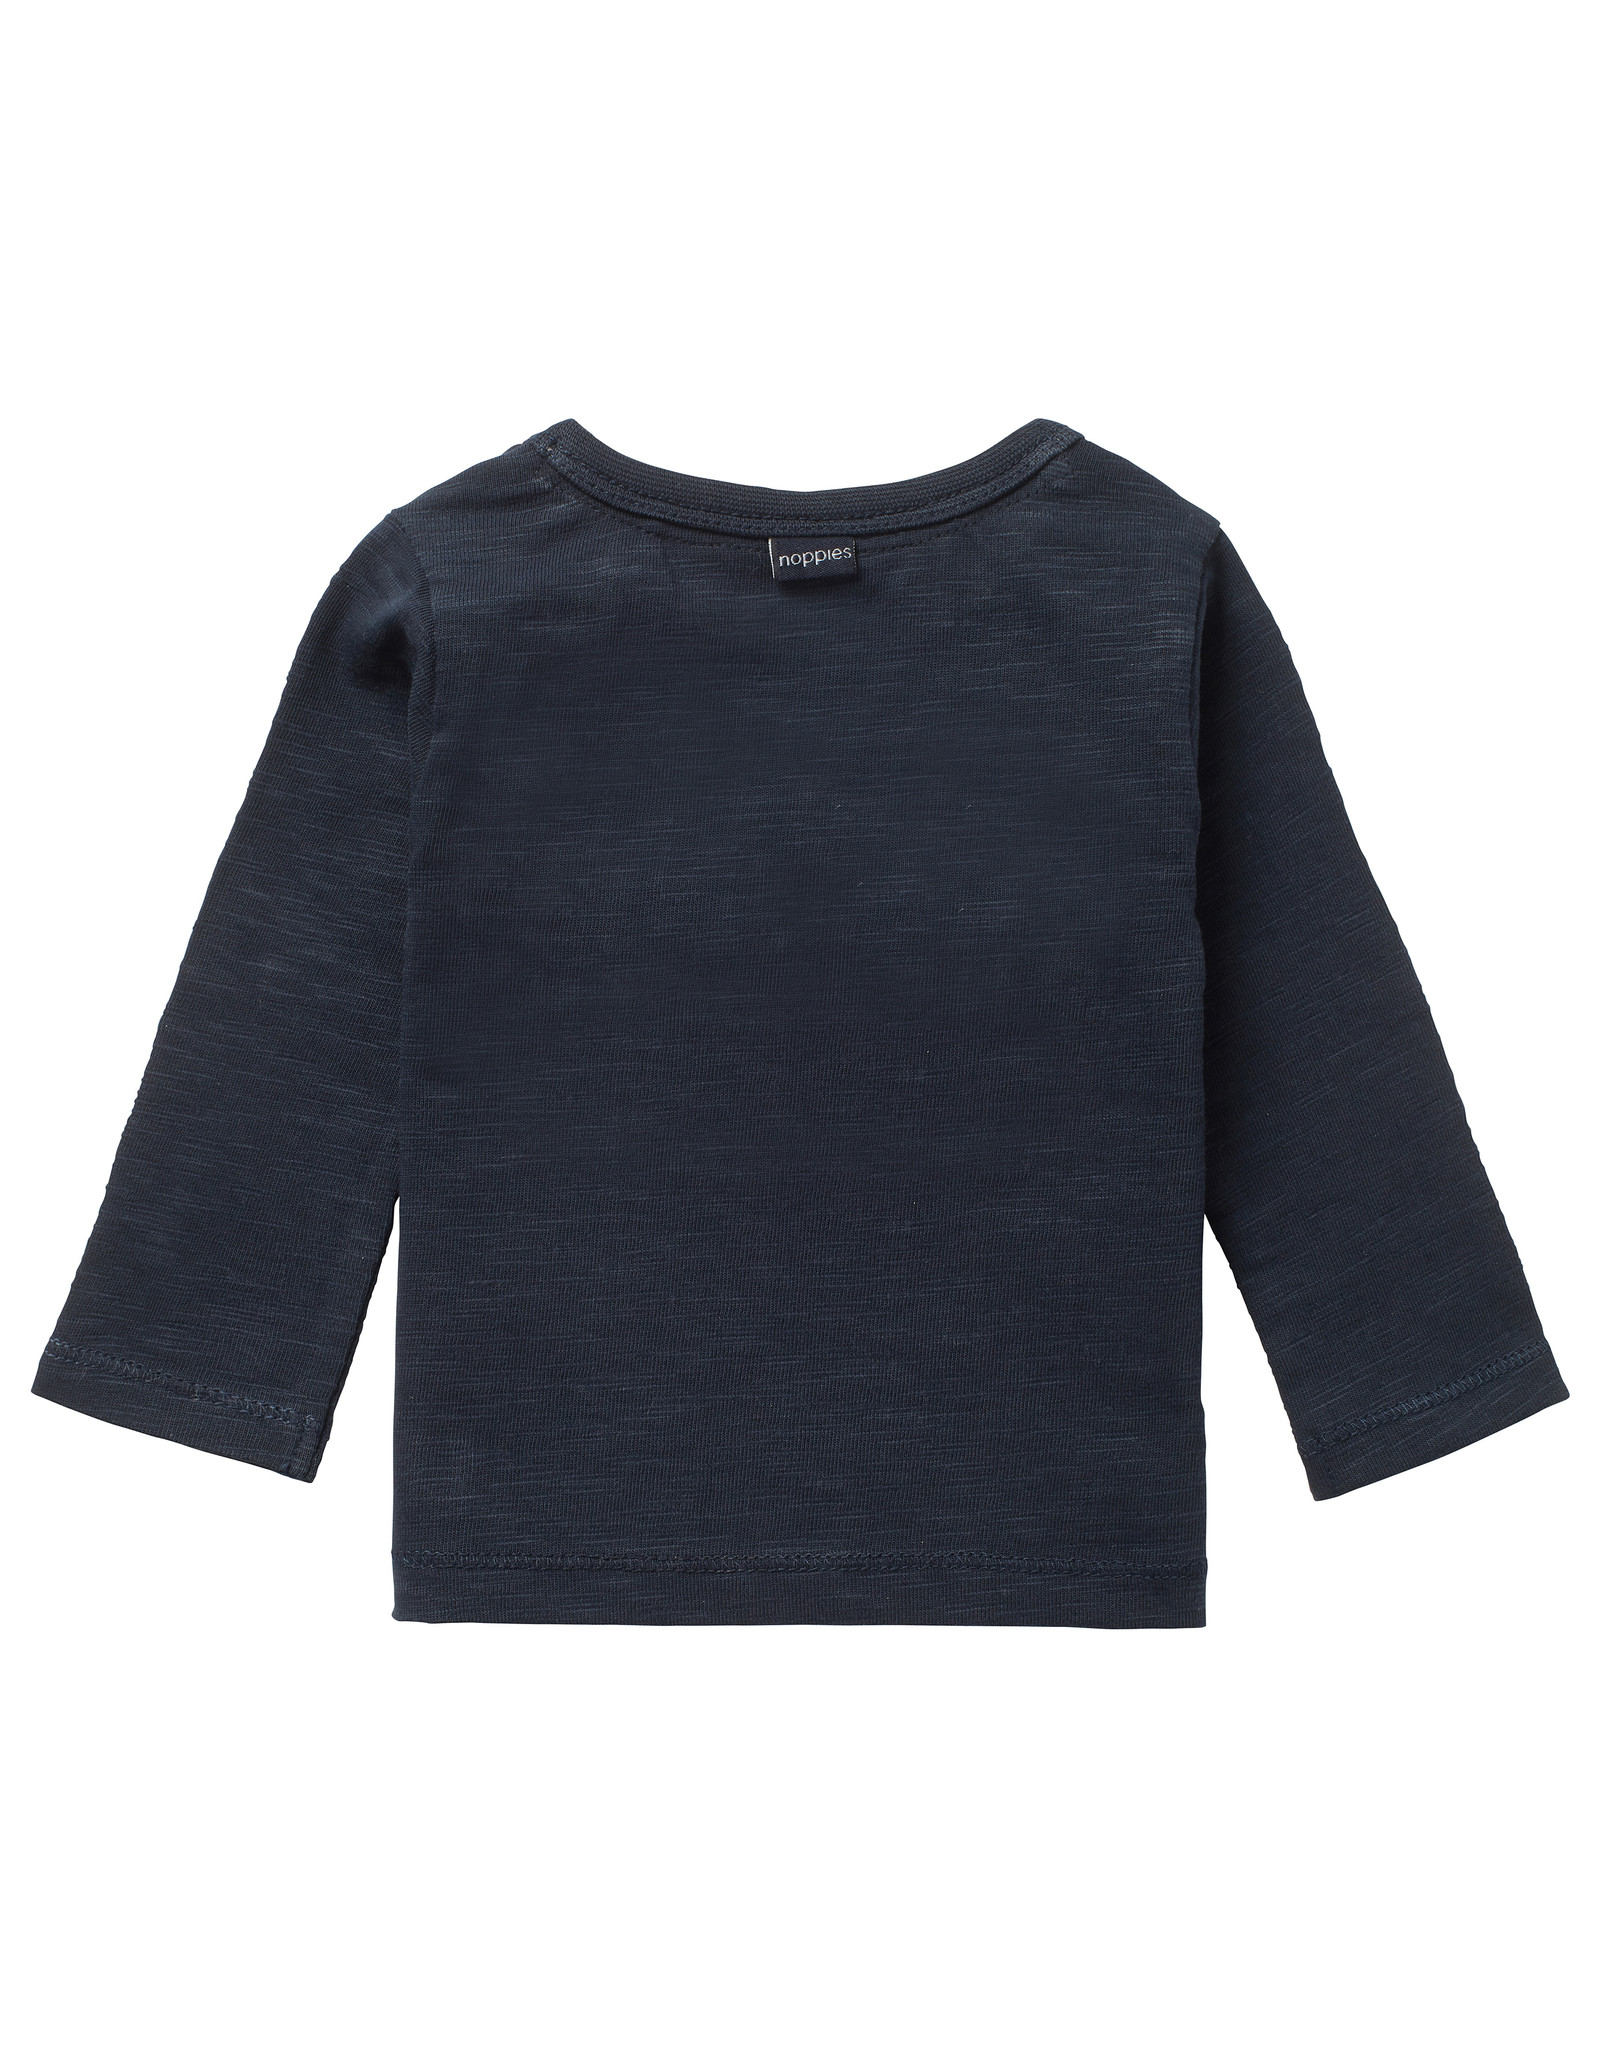 Noppies Shirt Tilburg